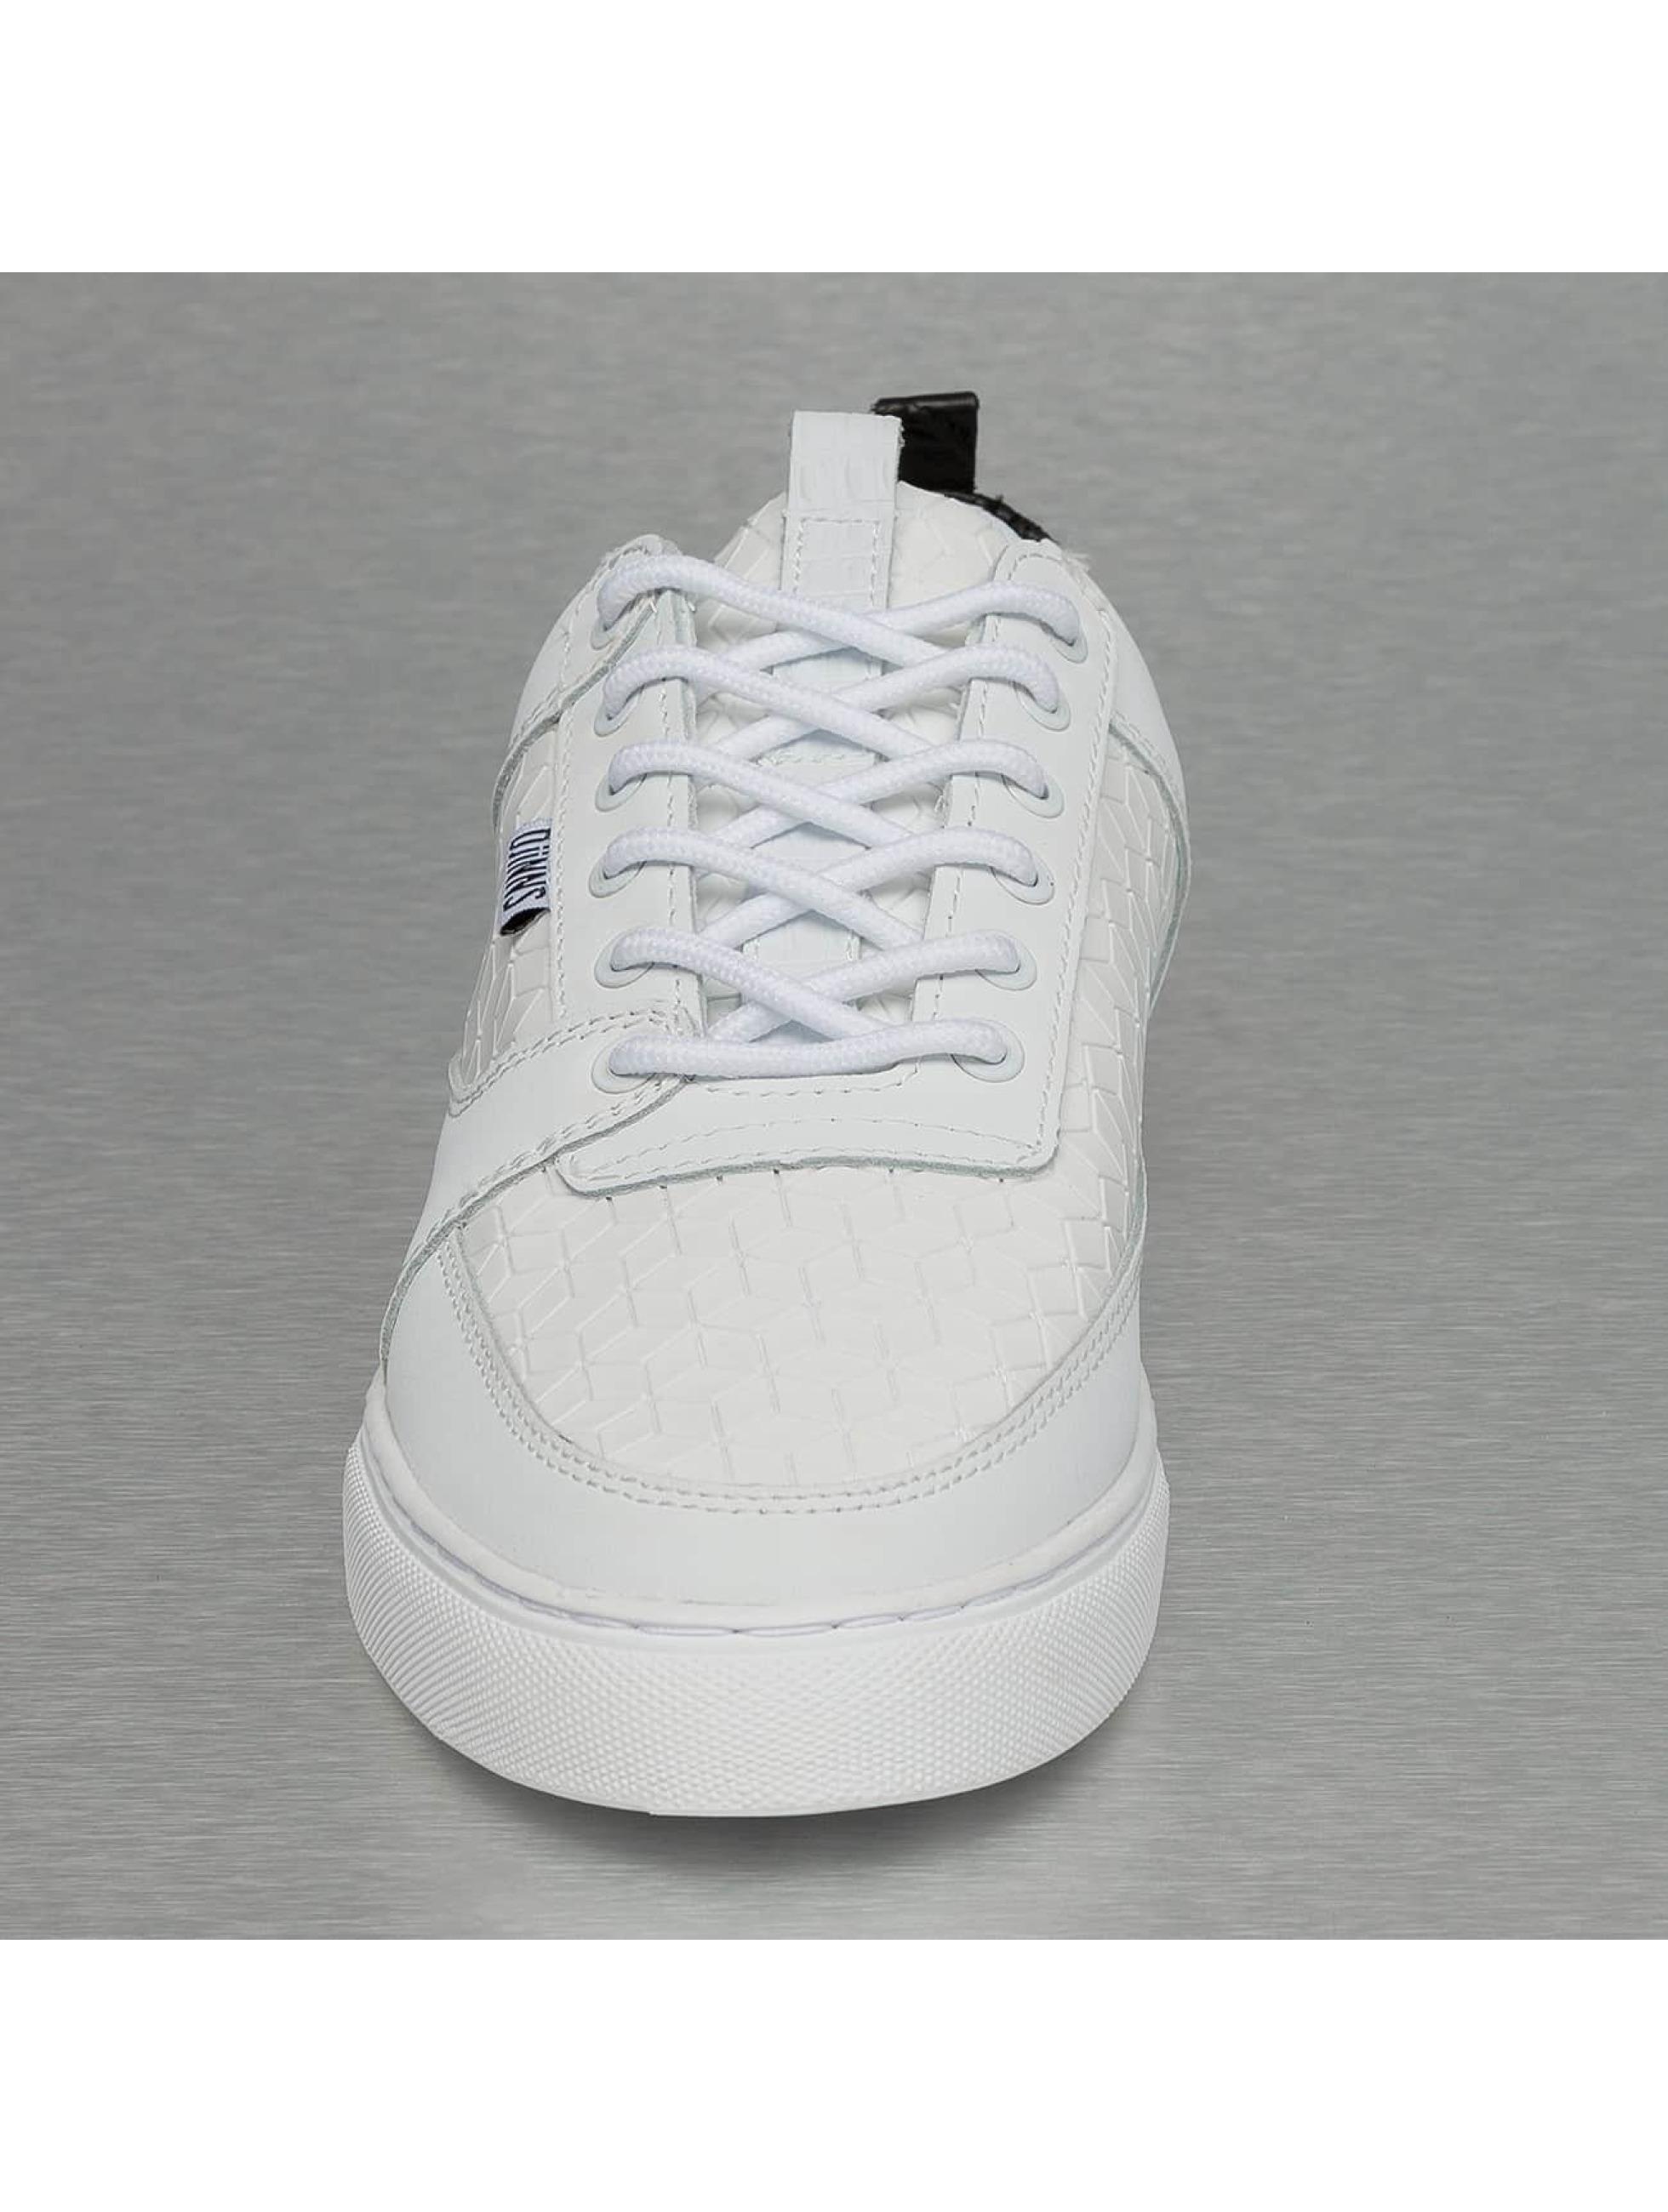 Djinns Sneakers Forlow Rubber Croc white